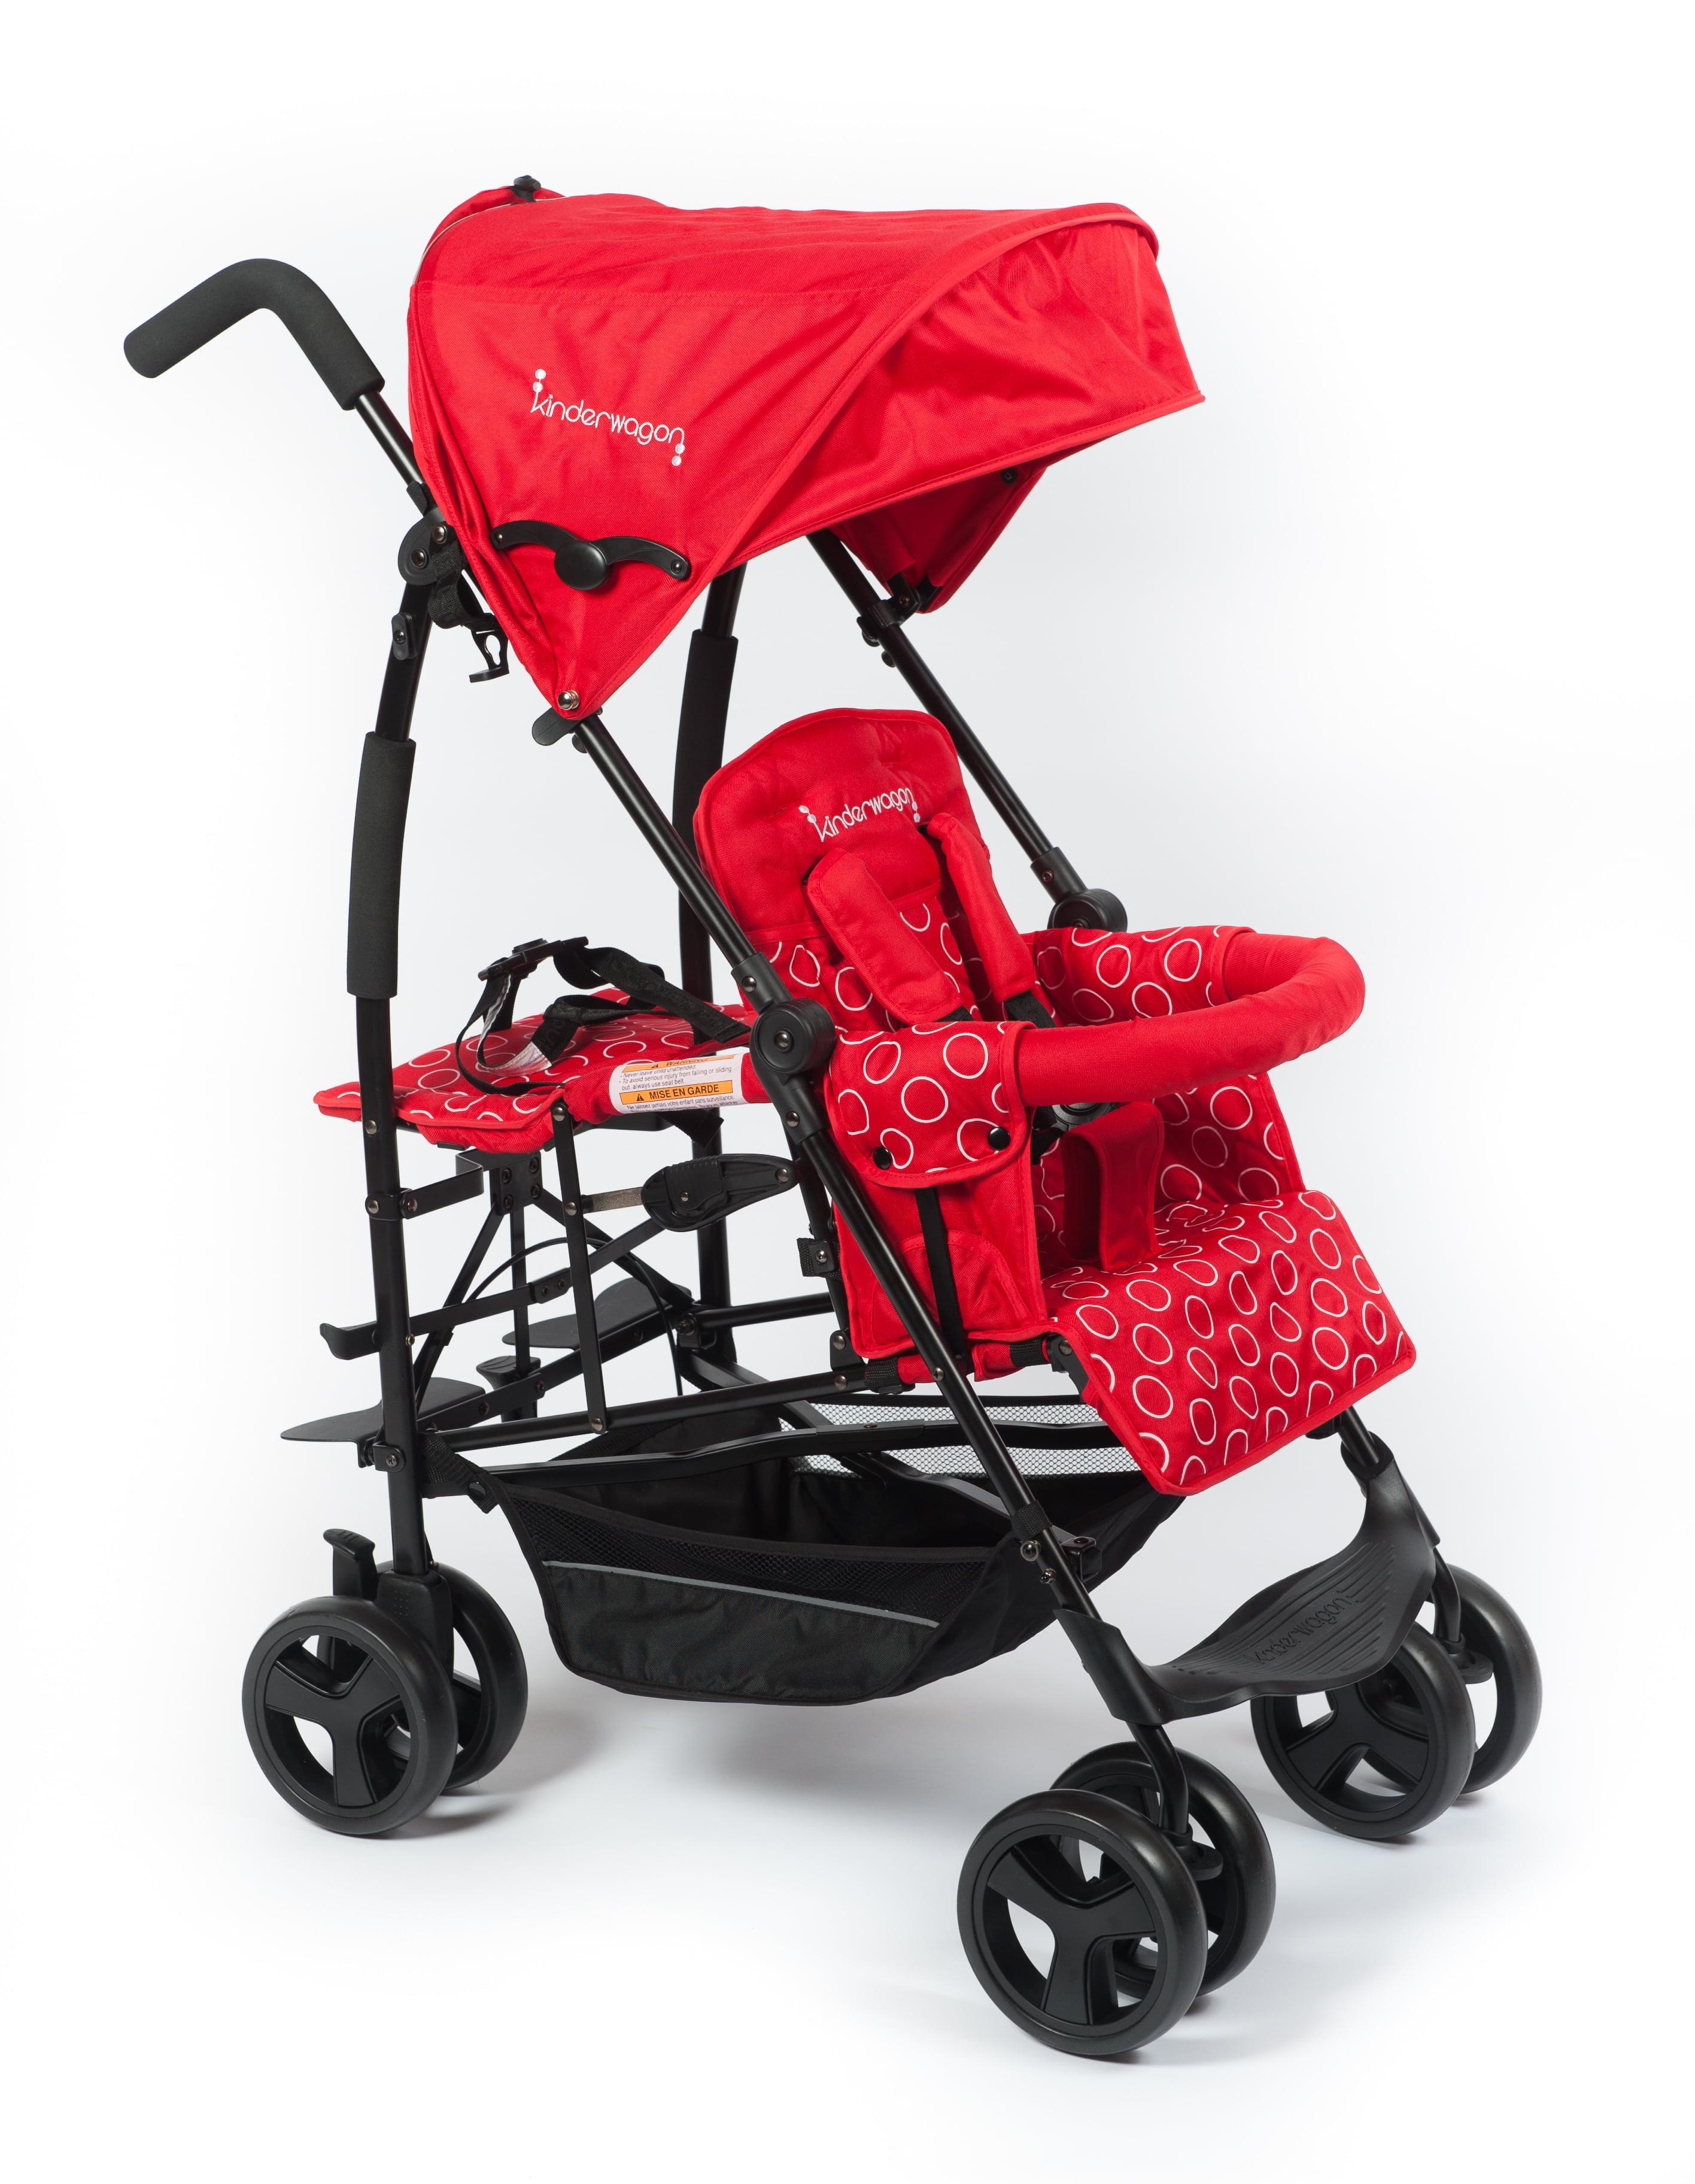 Kinderwagon Jump Tandem Umbrella Stroller with Platform Seat Red by Kinderwagon